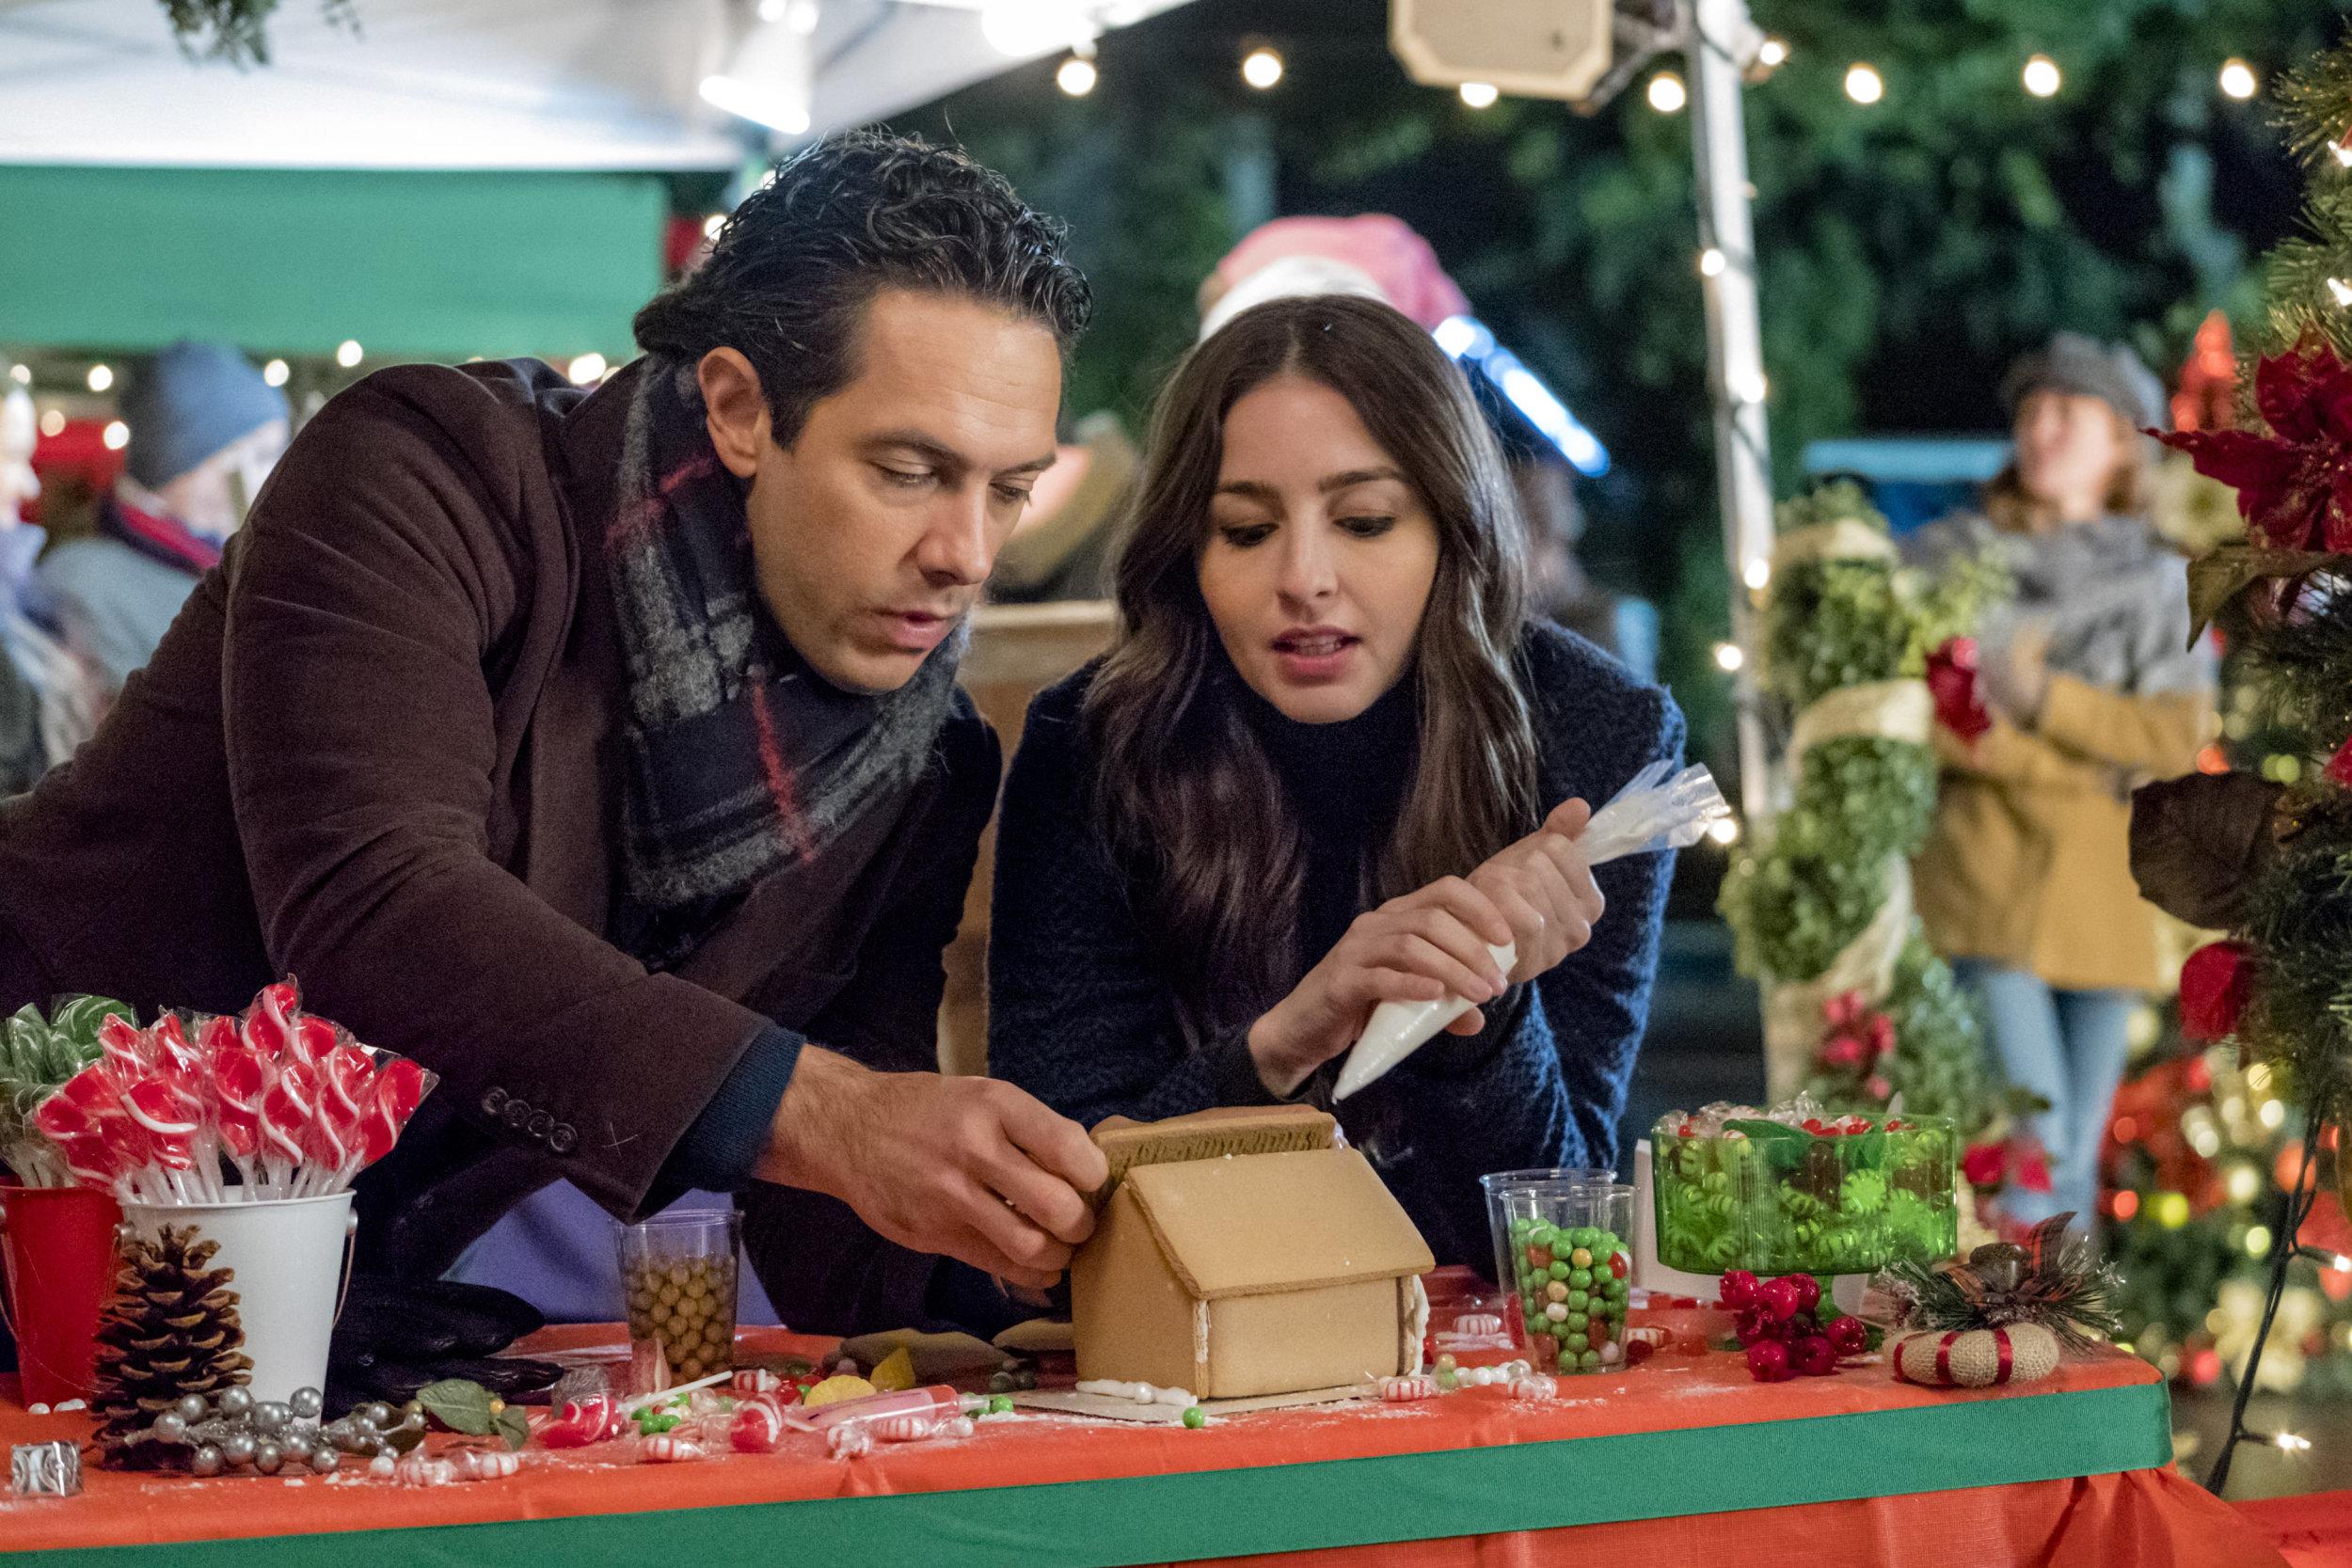 A Joyous Christmas 2019 A Joyous Christmas   About | Hallmark Movies and Mysteries